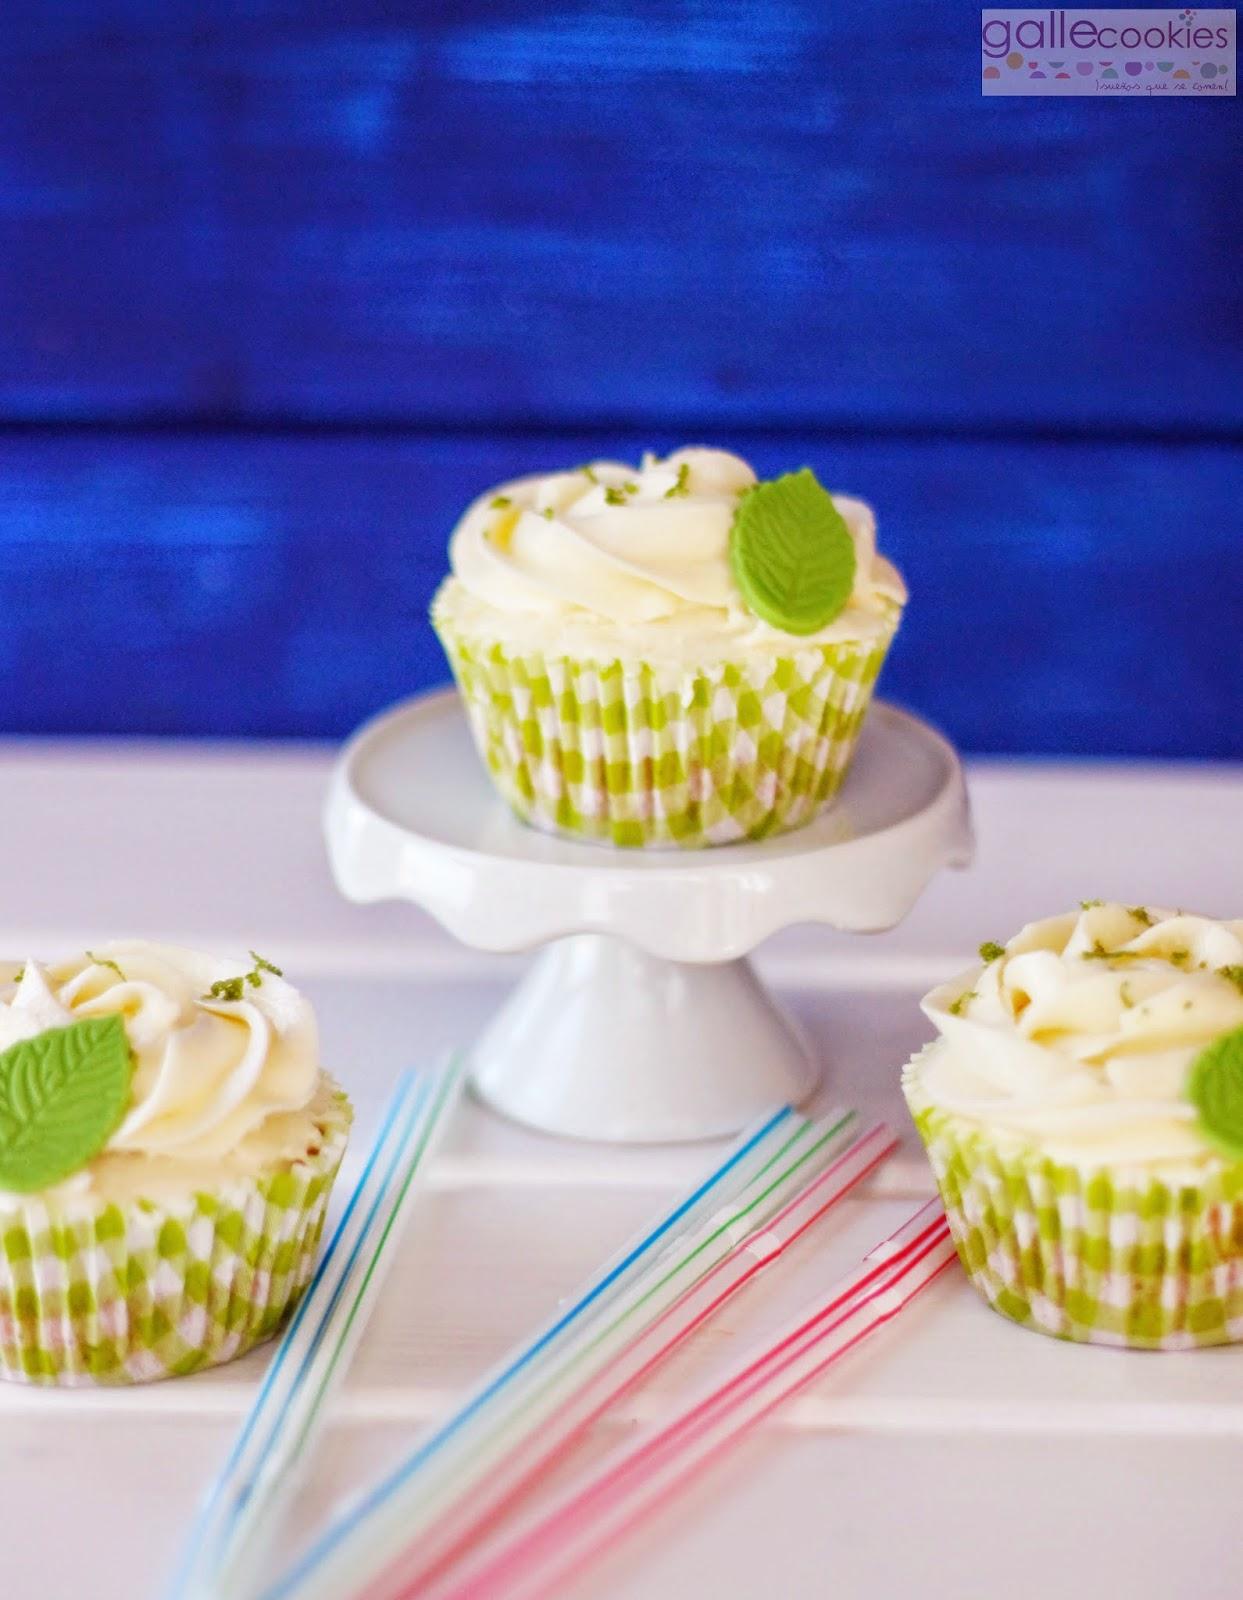 Imagen de cupcakes de mojito de Iratxe Ayala - Gallecookies